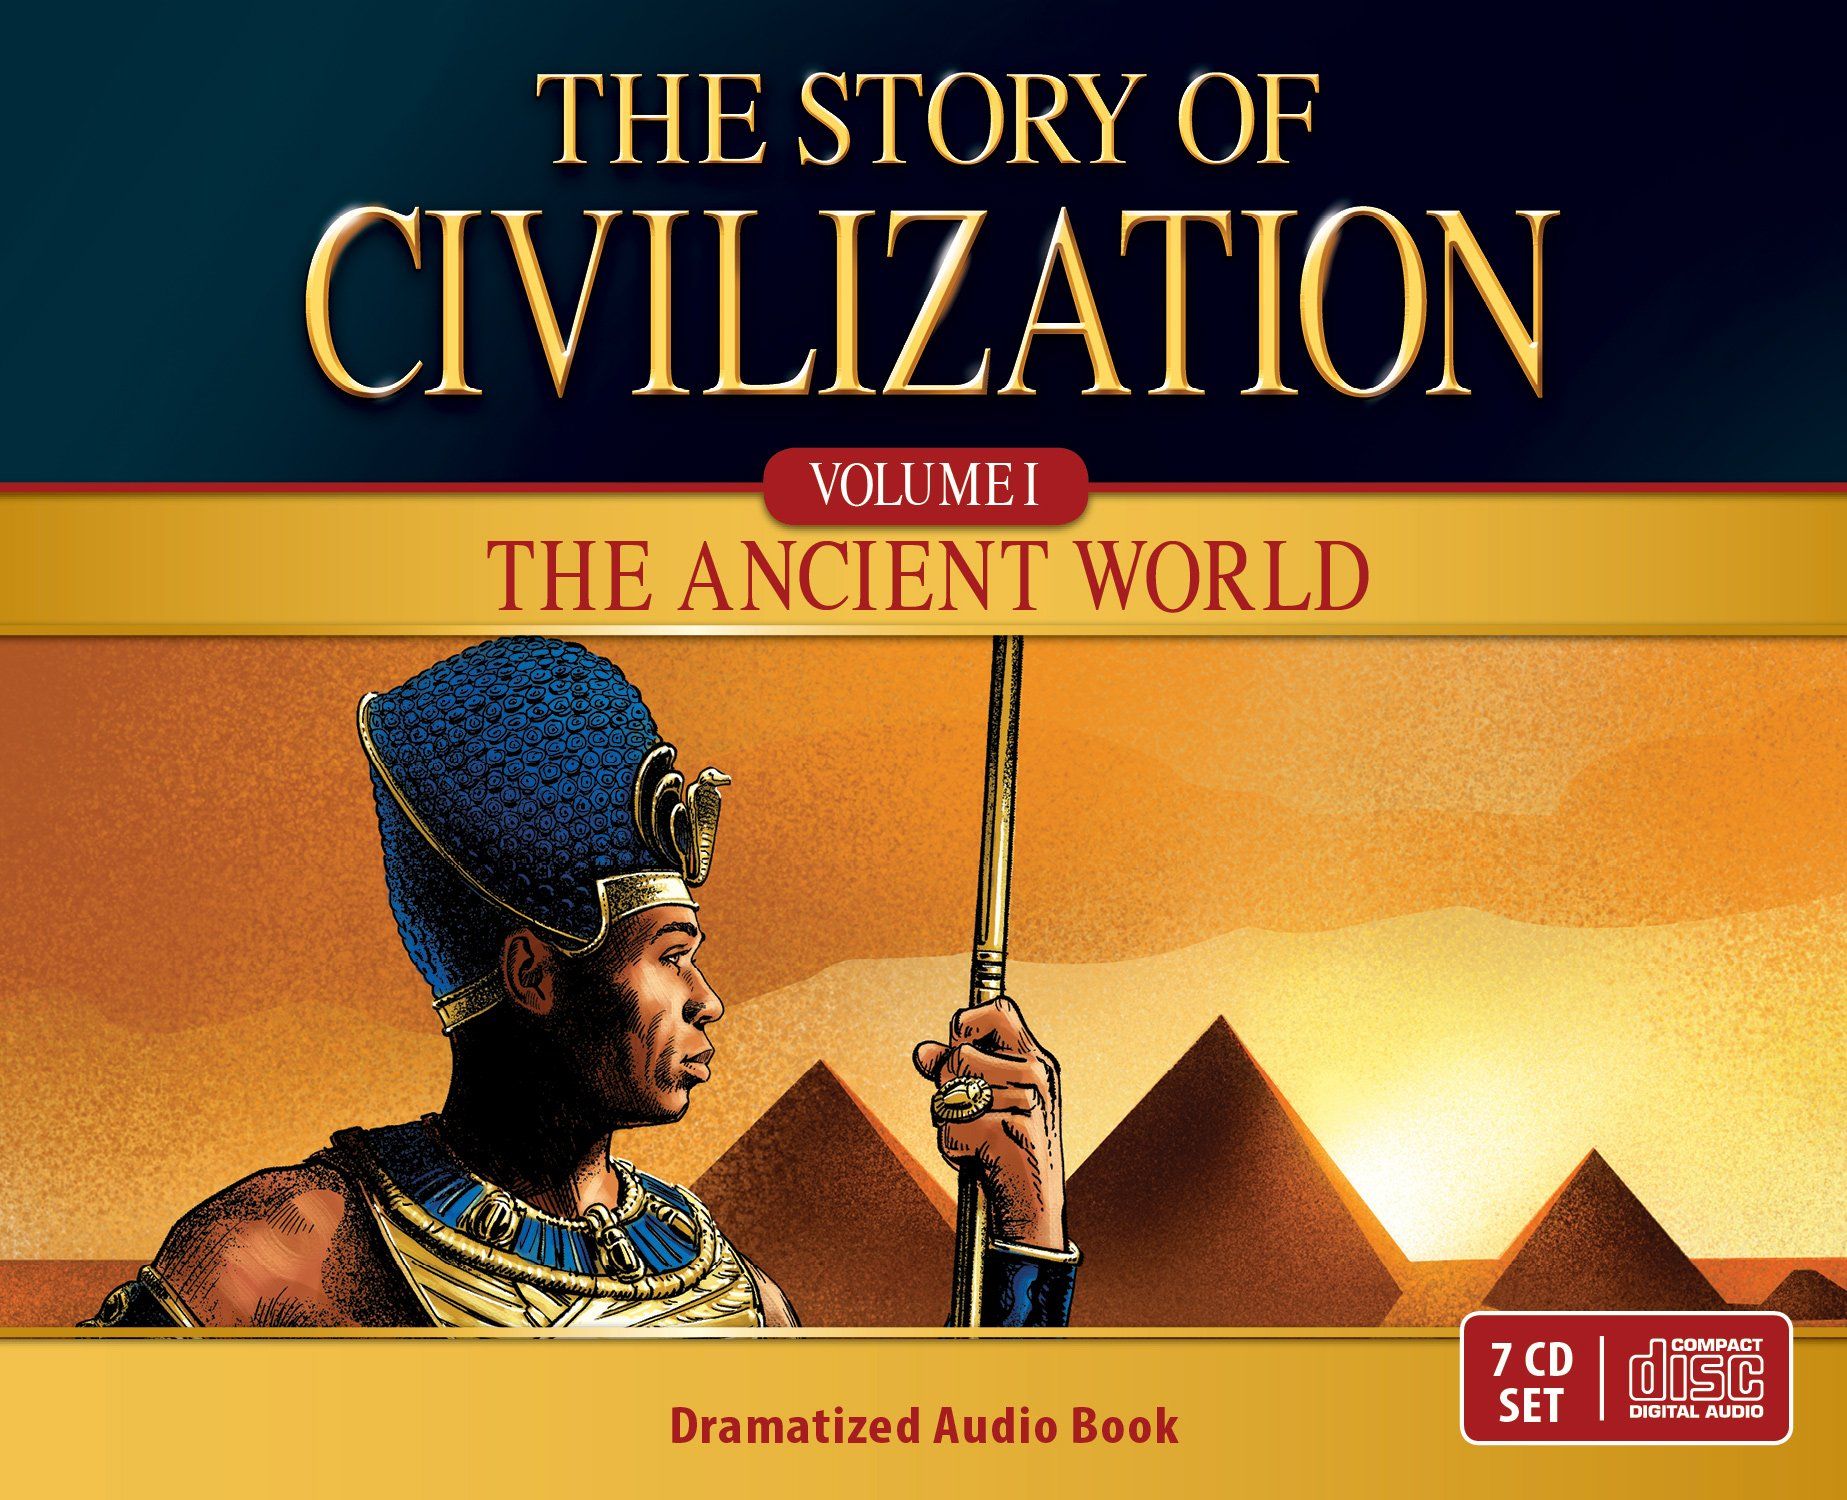 The Story of Civilization Audio Dramatization: VOLUME I - The Ancient World